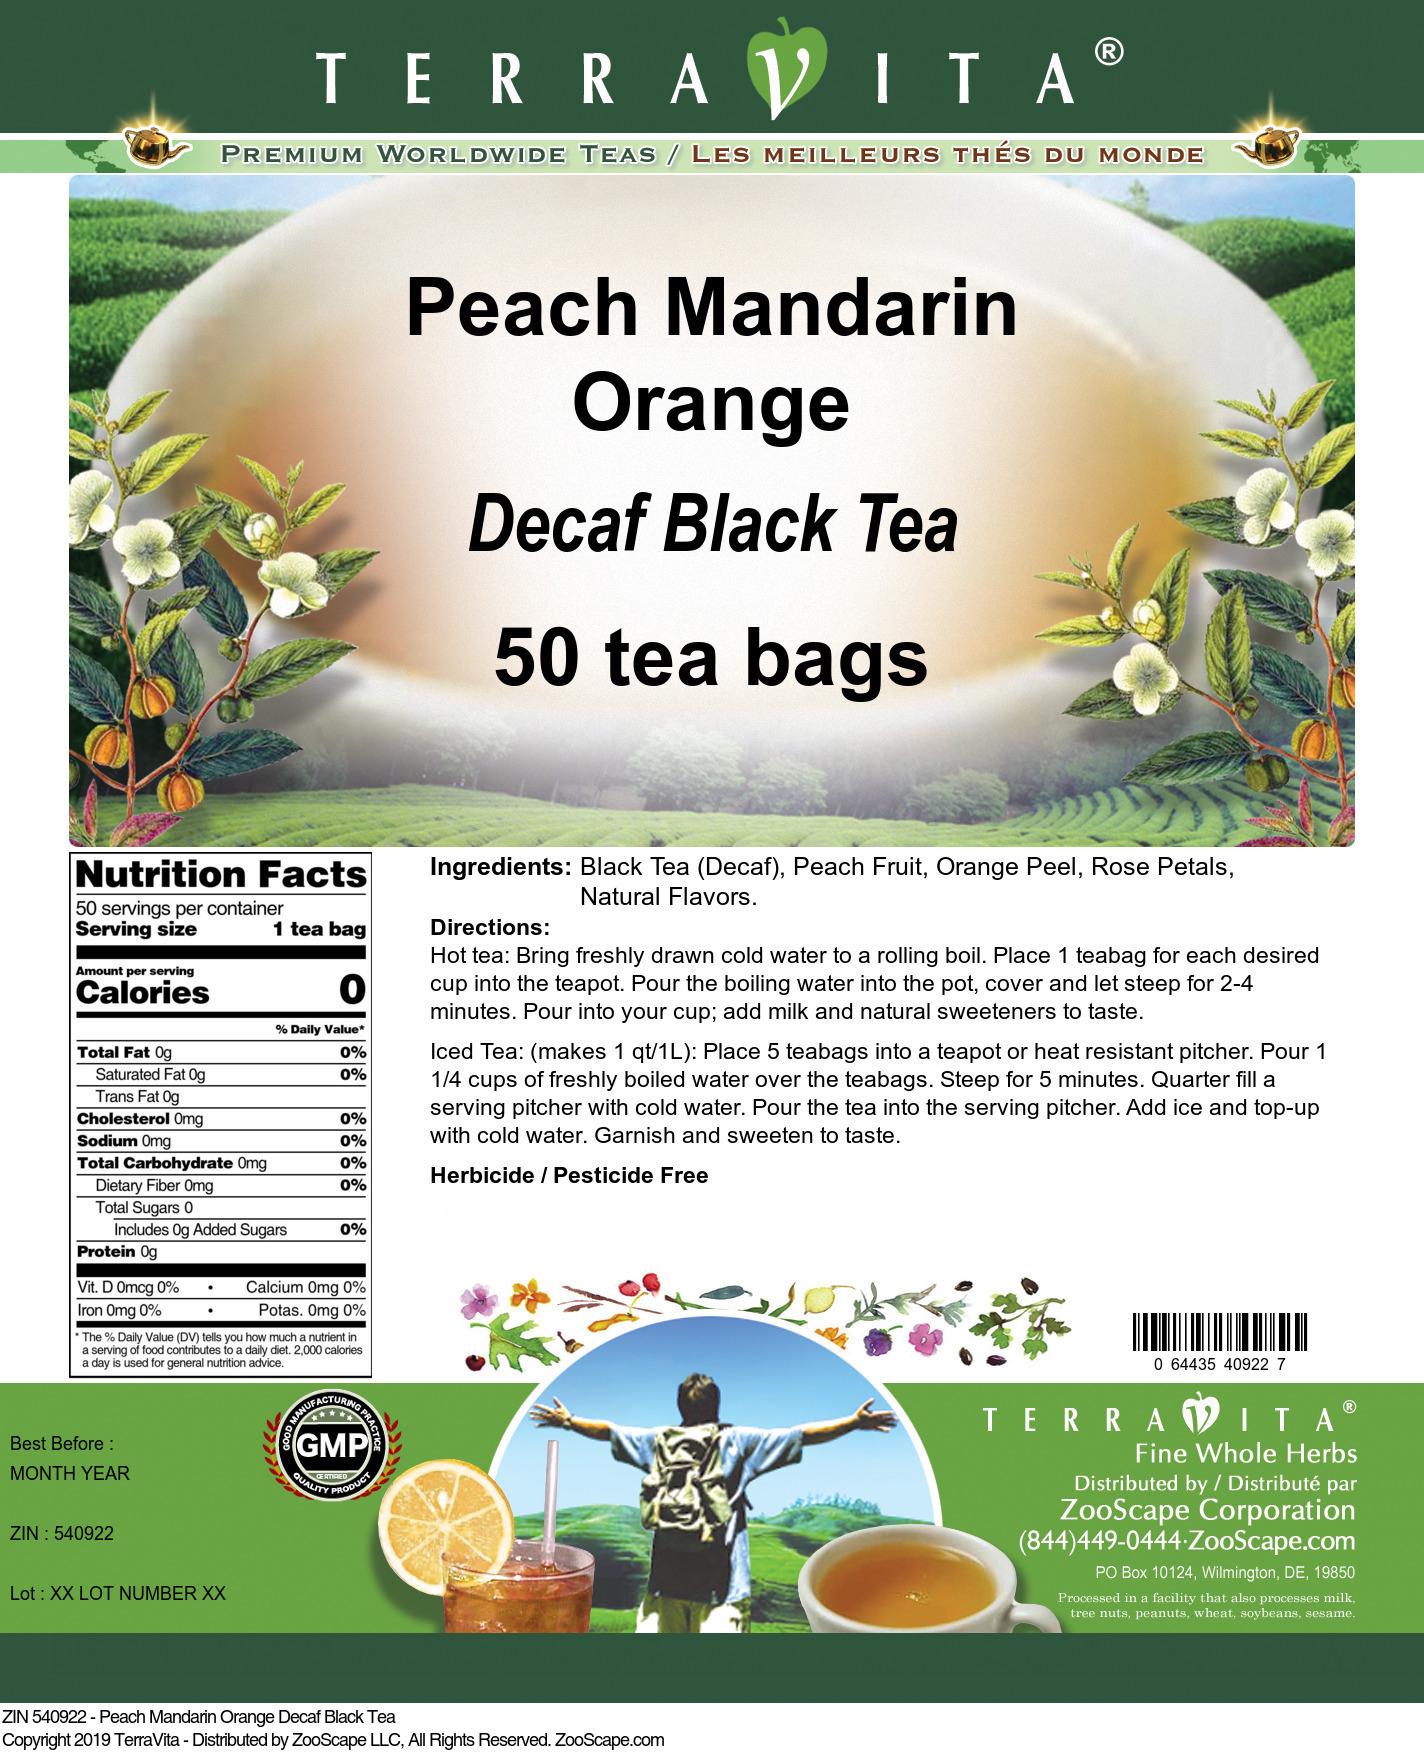 Peach Mandarin Orange Decaf Black Tea